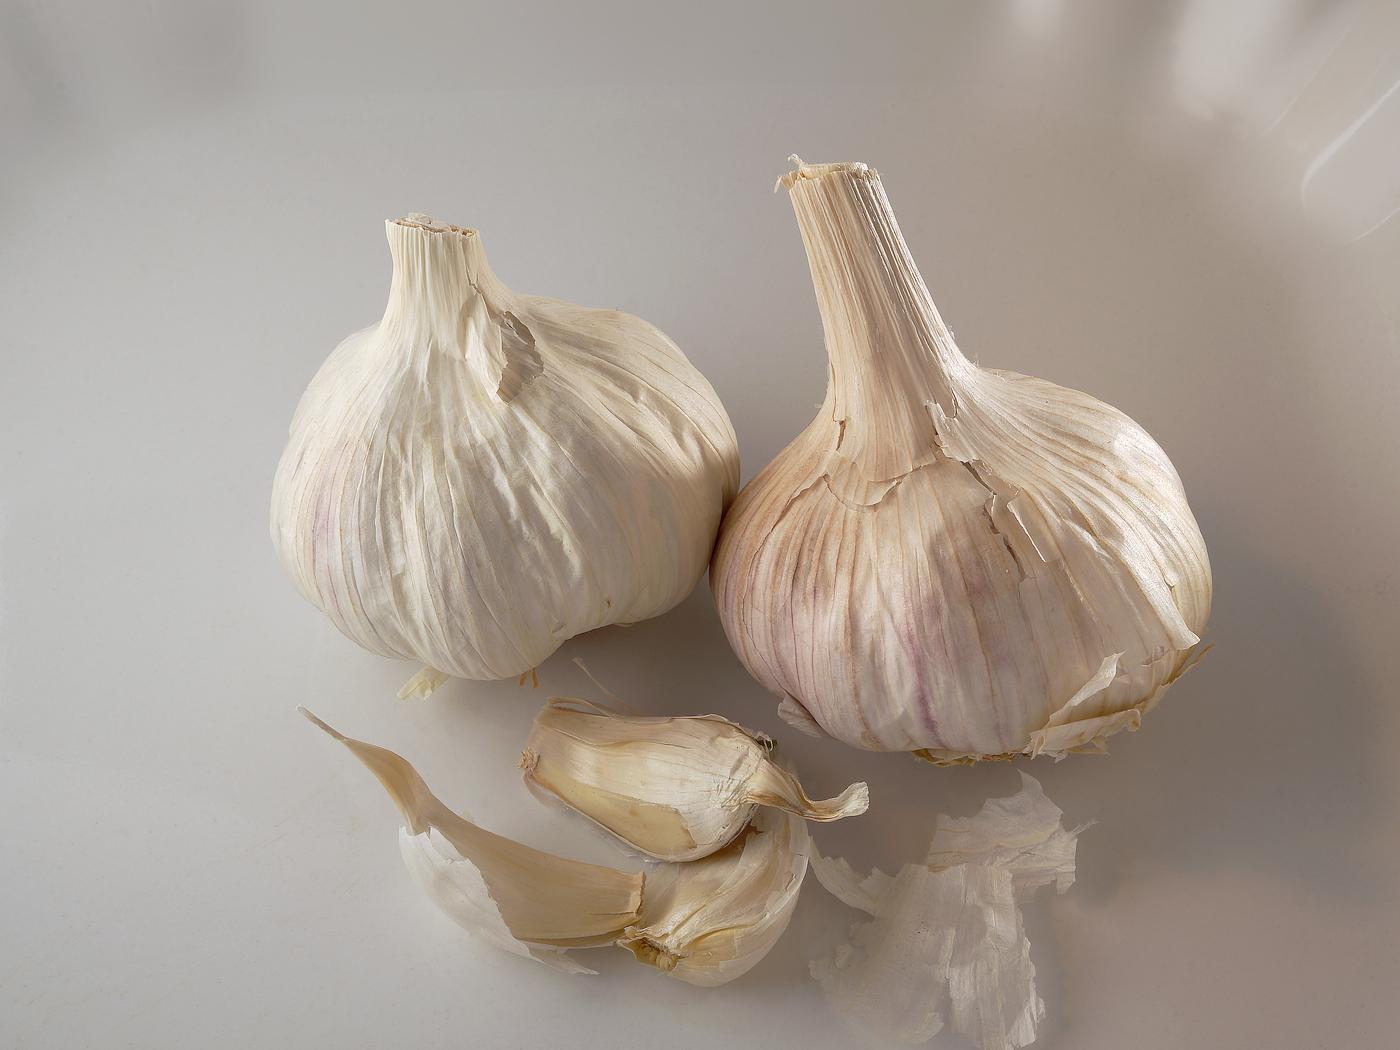 IMAGE: http://makino.fi/rico/sony/misc/garlic2.jpg